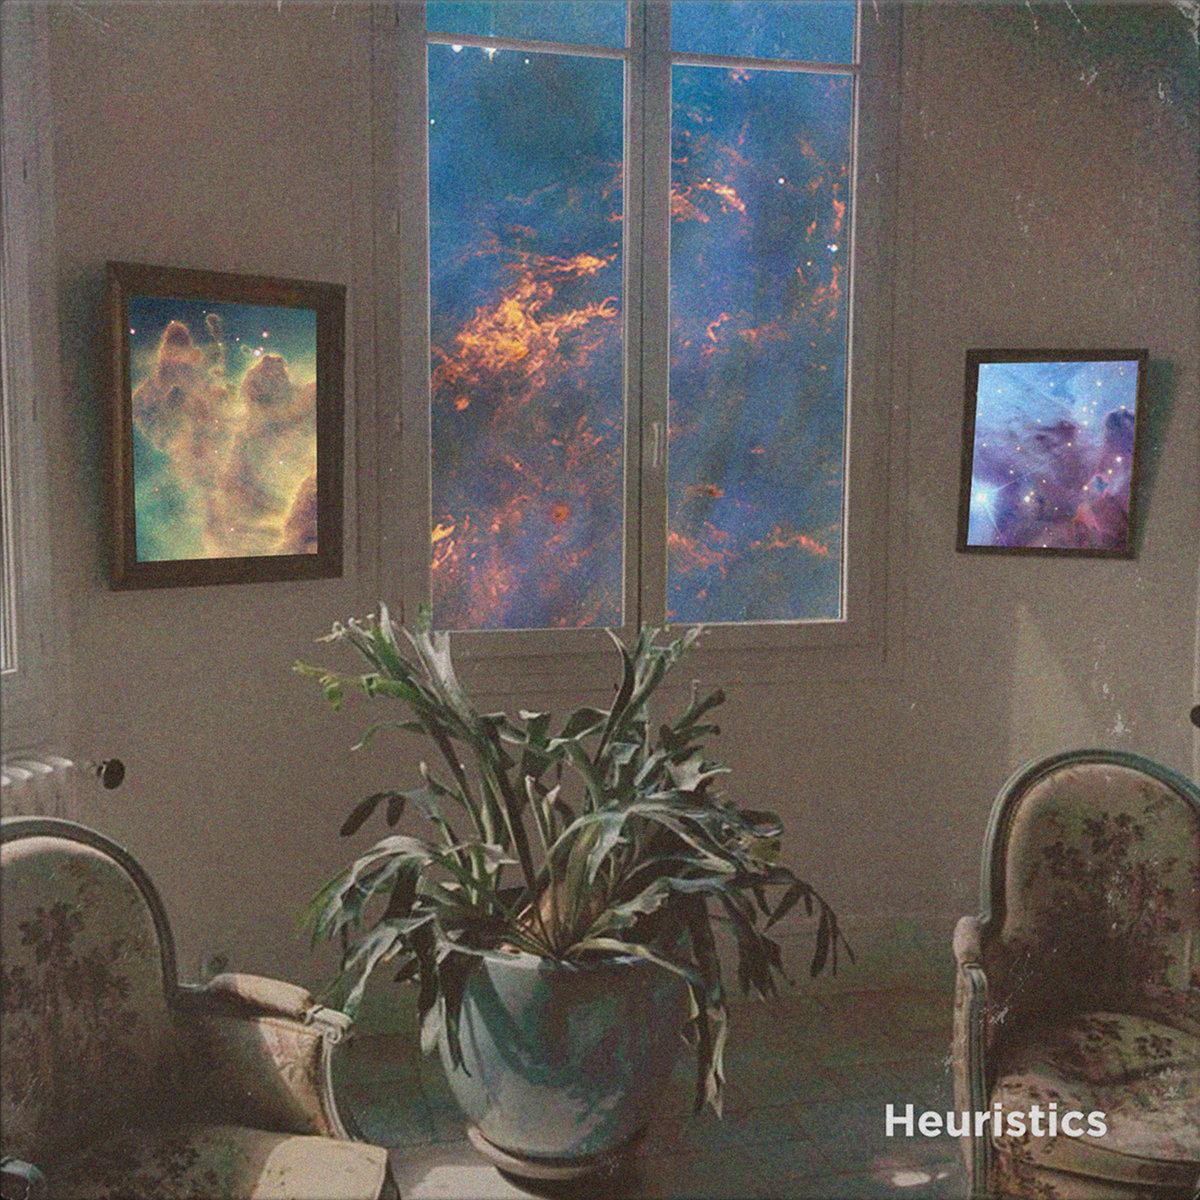 Mathieu Rouland - Heuristics [EP] (2018)